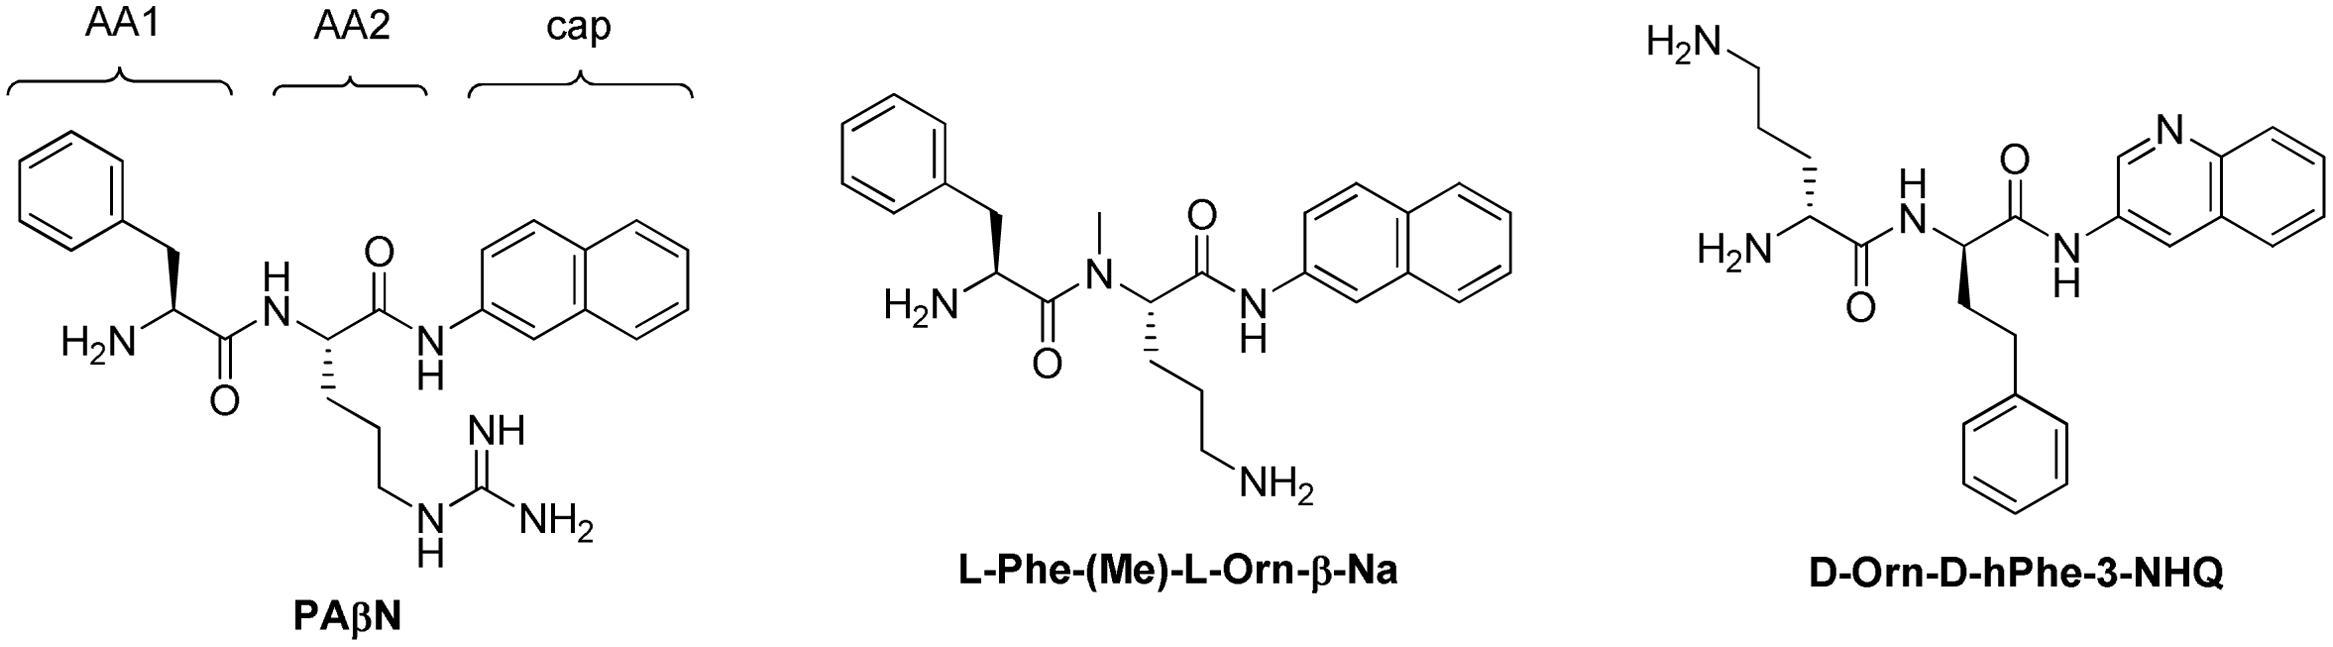 Efflux Pump Inhibitors Natural Products